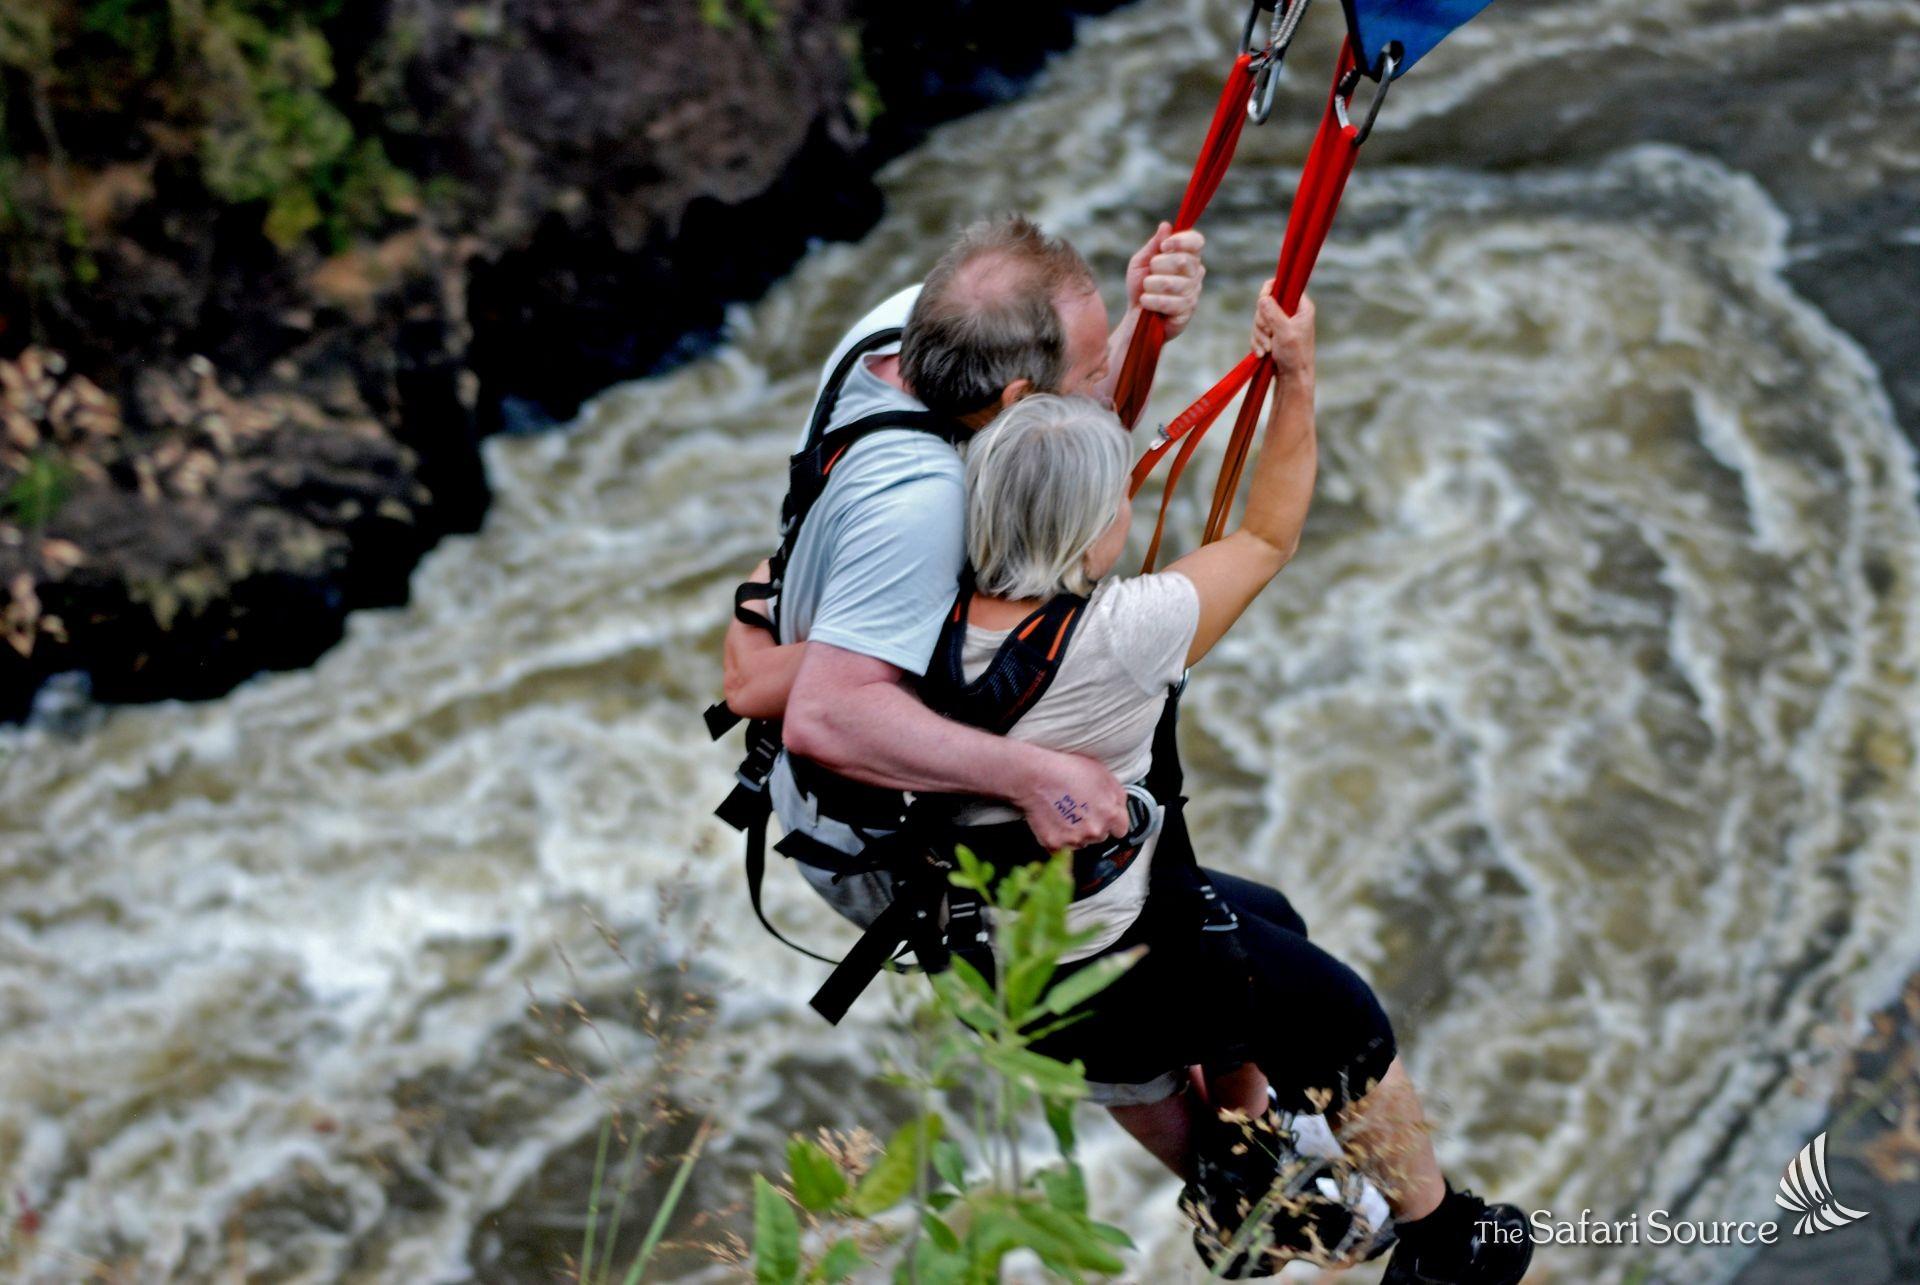 Bungee Jumping off the Victoria Falls Bridge